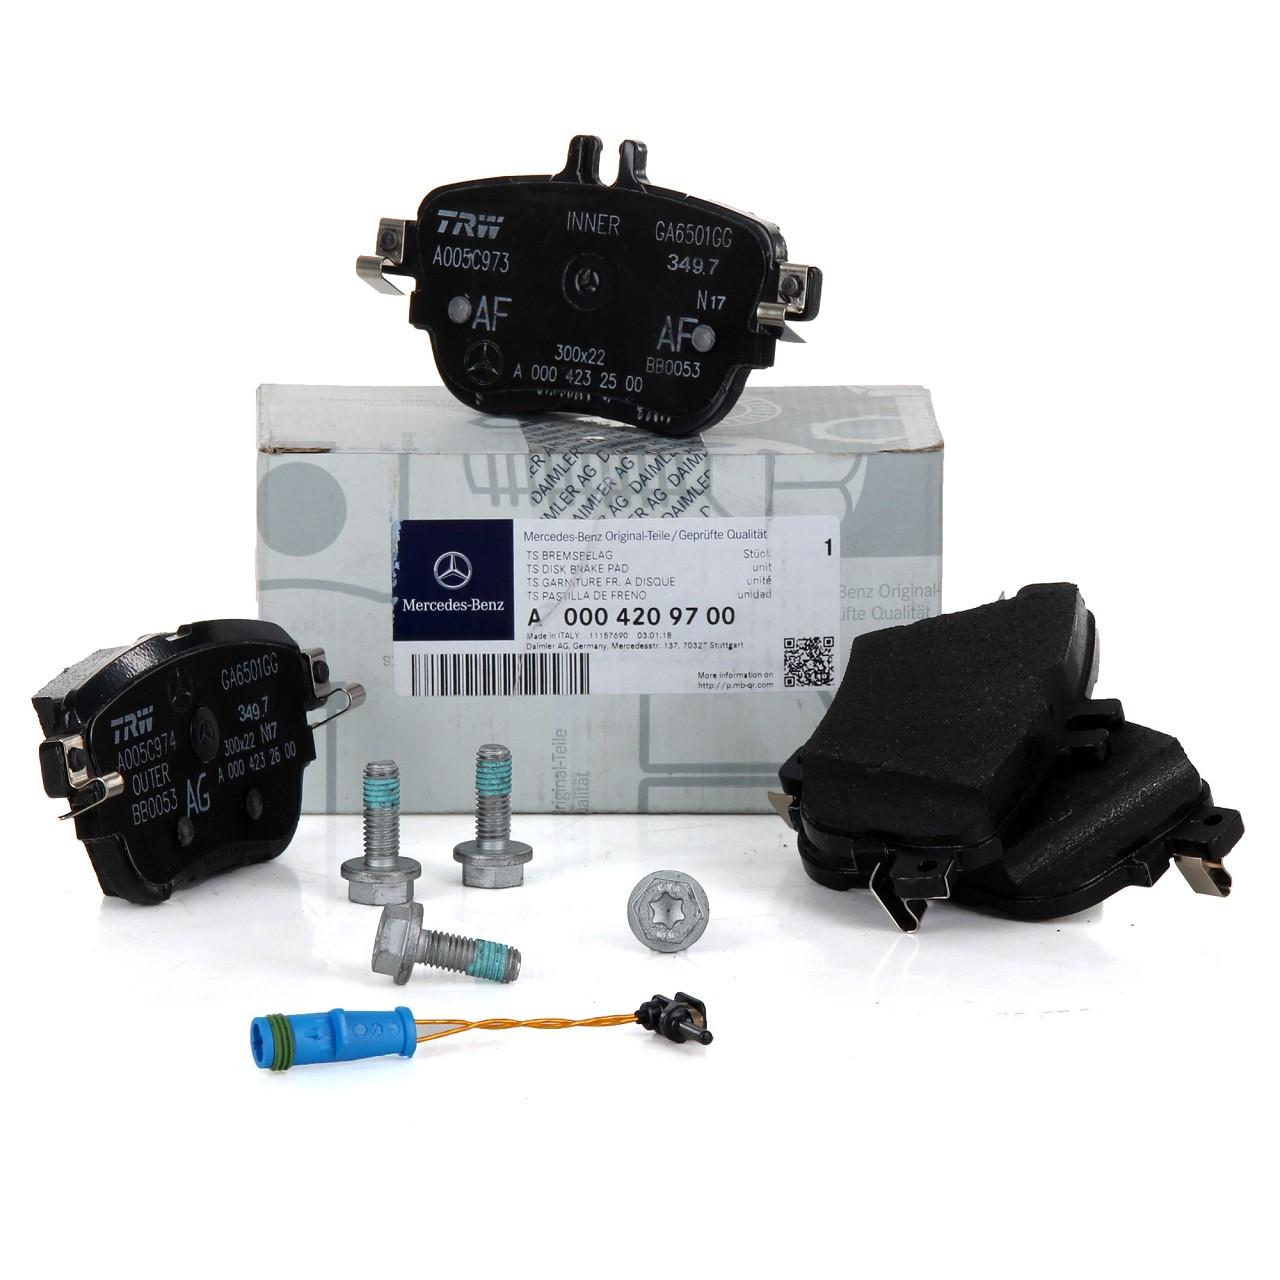 ORIGINAL Mercedes-Benz Bremsbeläge Bremsklötze + Wako E-KLASSE W213 S213 hinten